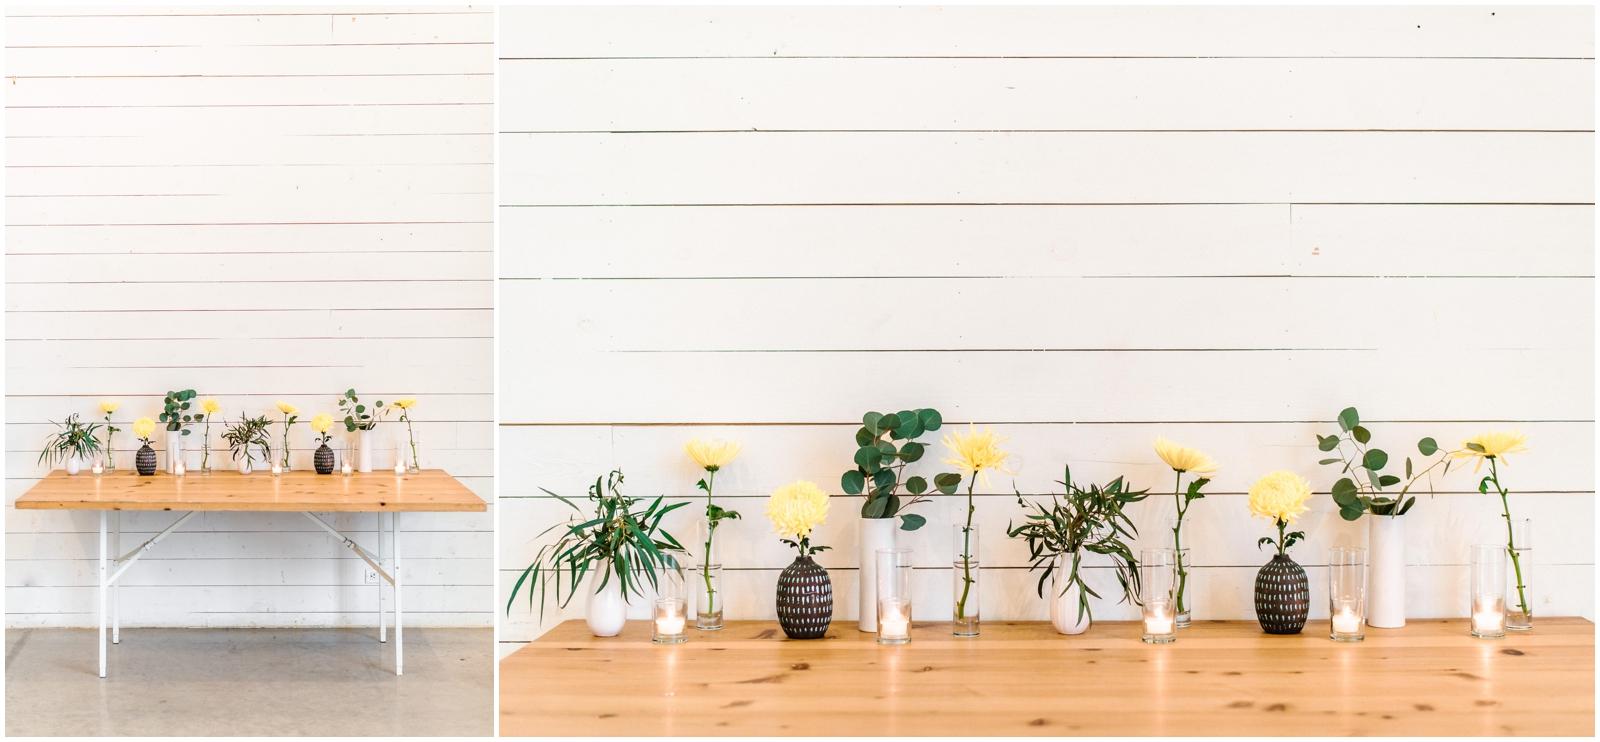 Minimalistic TX Venue Prosper House -Austin Wedding Planner_0359.jpg